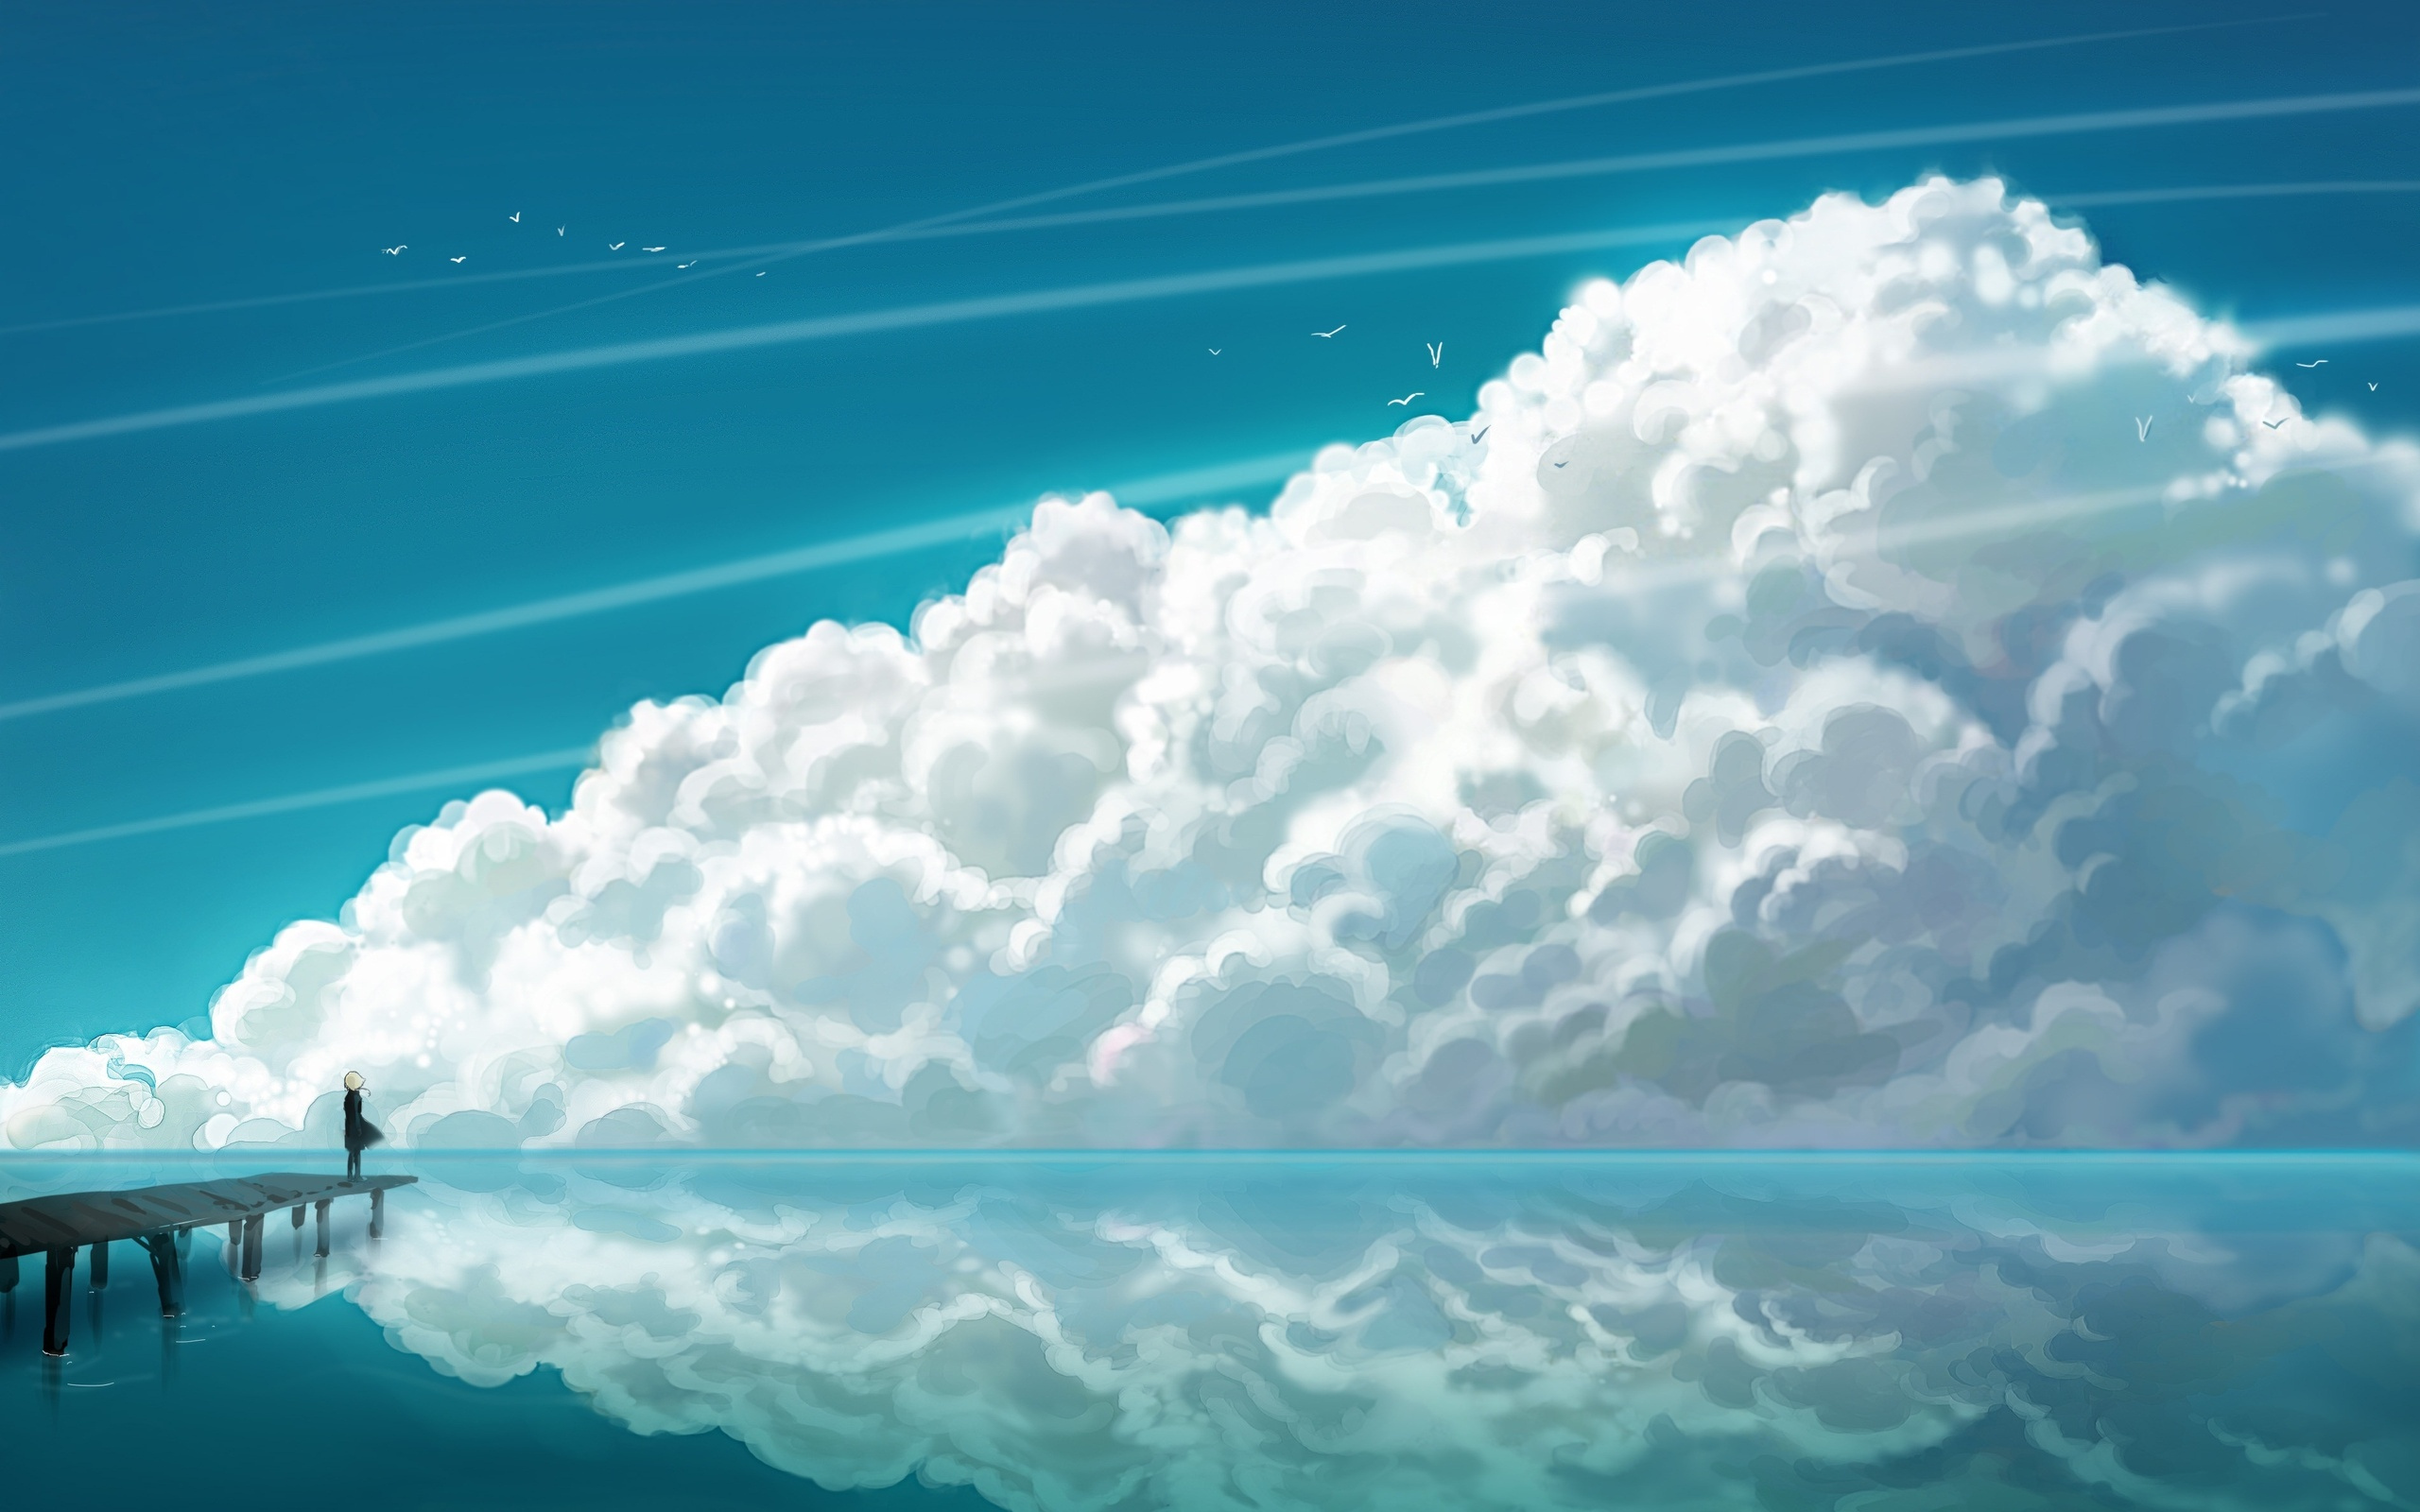 Обои Вода, Облака. Пейзажи foto 15